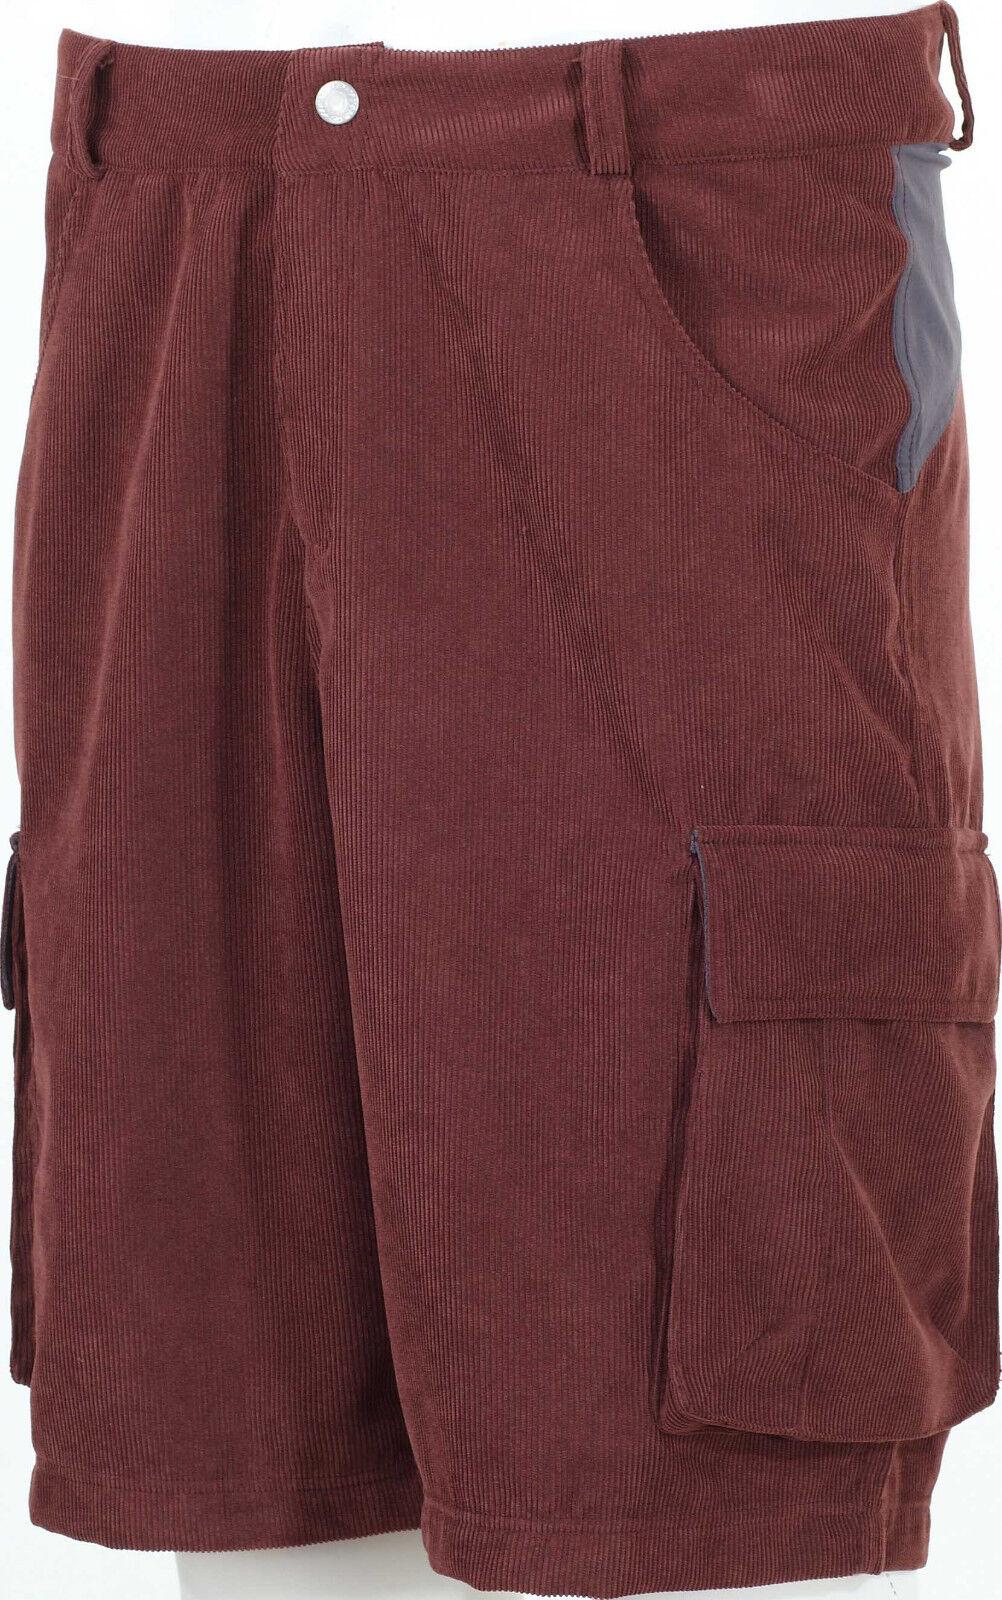 ZIENER Men's BIKESHORT Bike Pants Shorts Cord x Function Cafer 663 Wine Red NEW